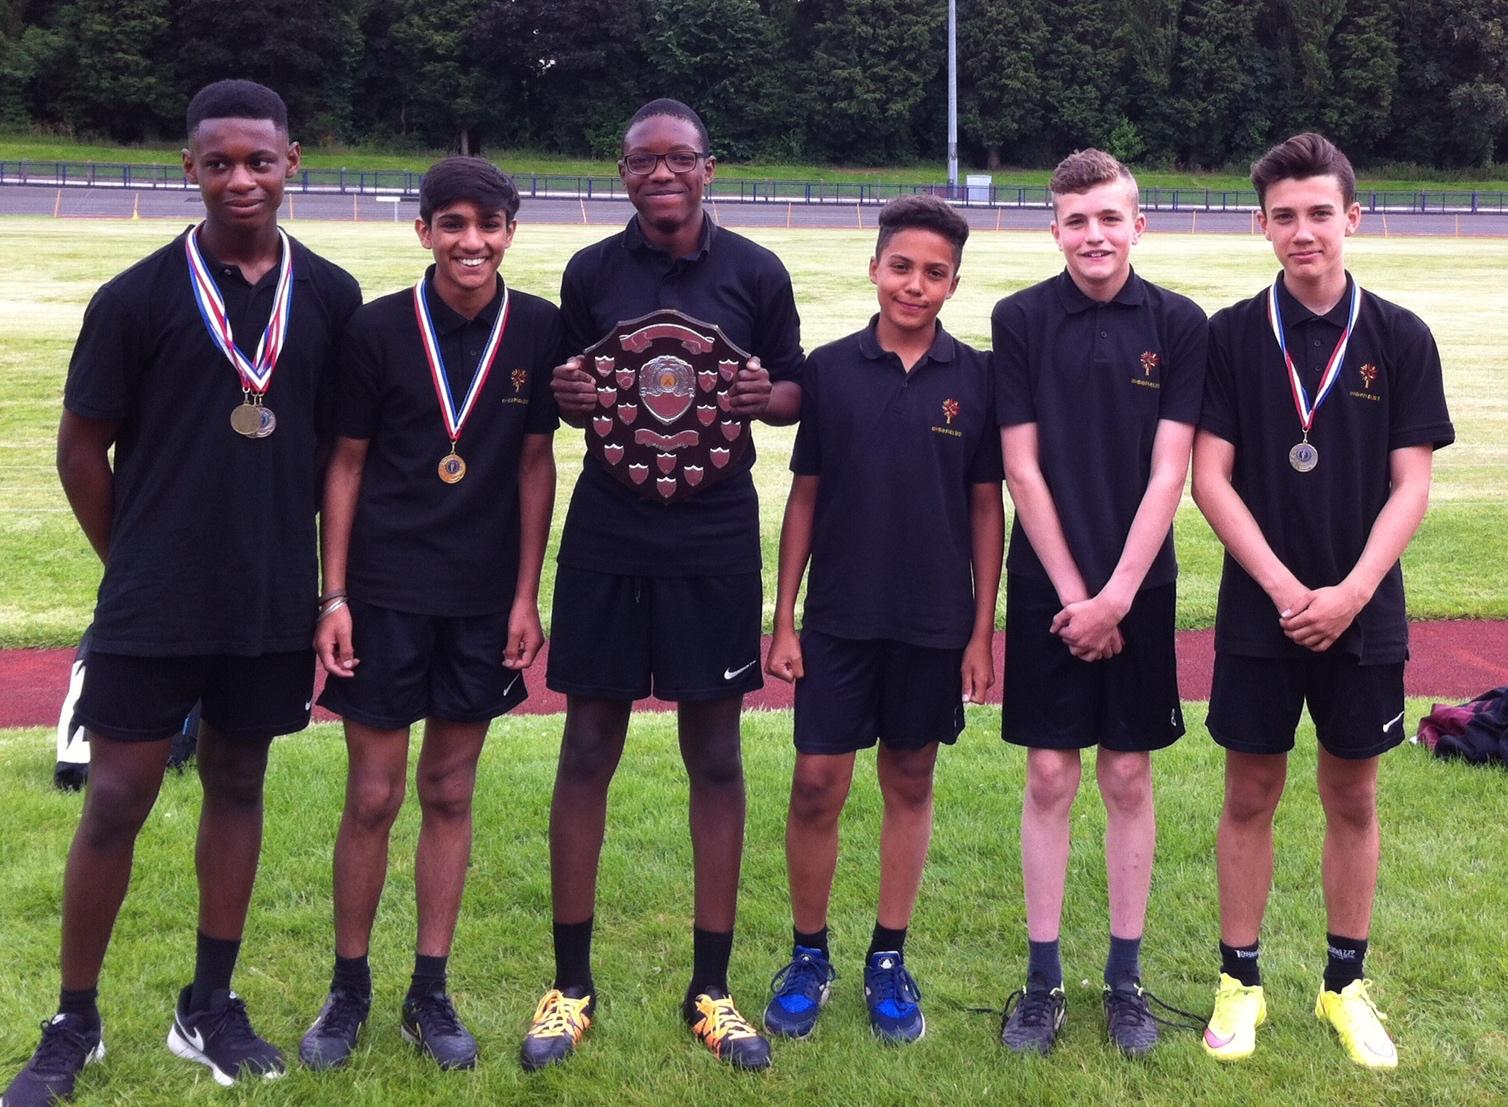 Members of the Year 8 winning team (from L-R)Eric Omozee, Gurkaran Khangura, Emmanuel Falade, Seb Boydell, Joel Adderley, Finley Cooper